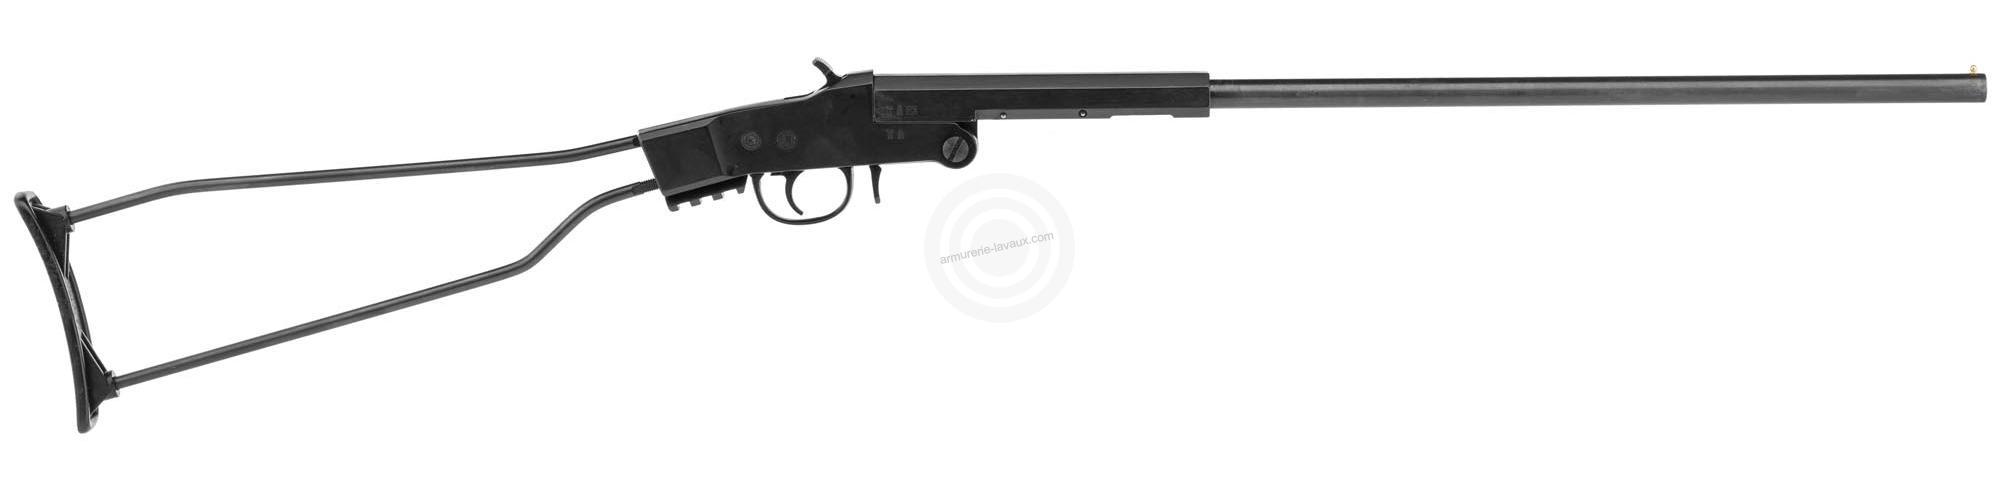 Carabine chiappa little badger flobbert rayon for Carabine de jardin